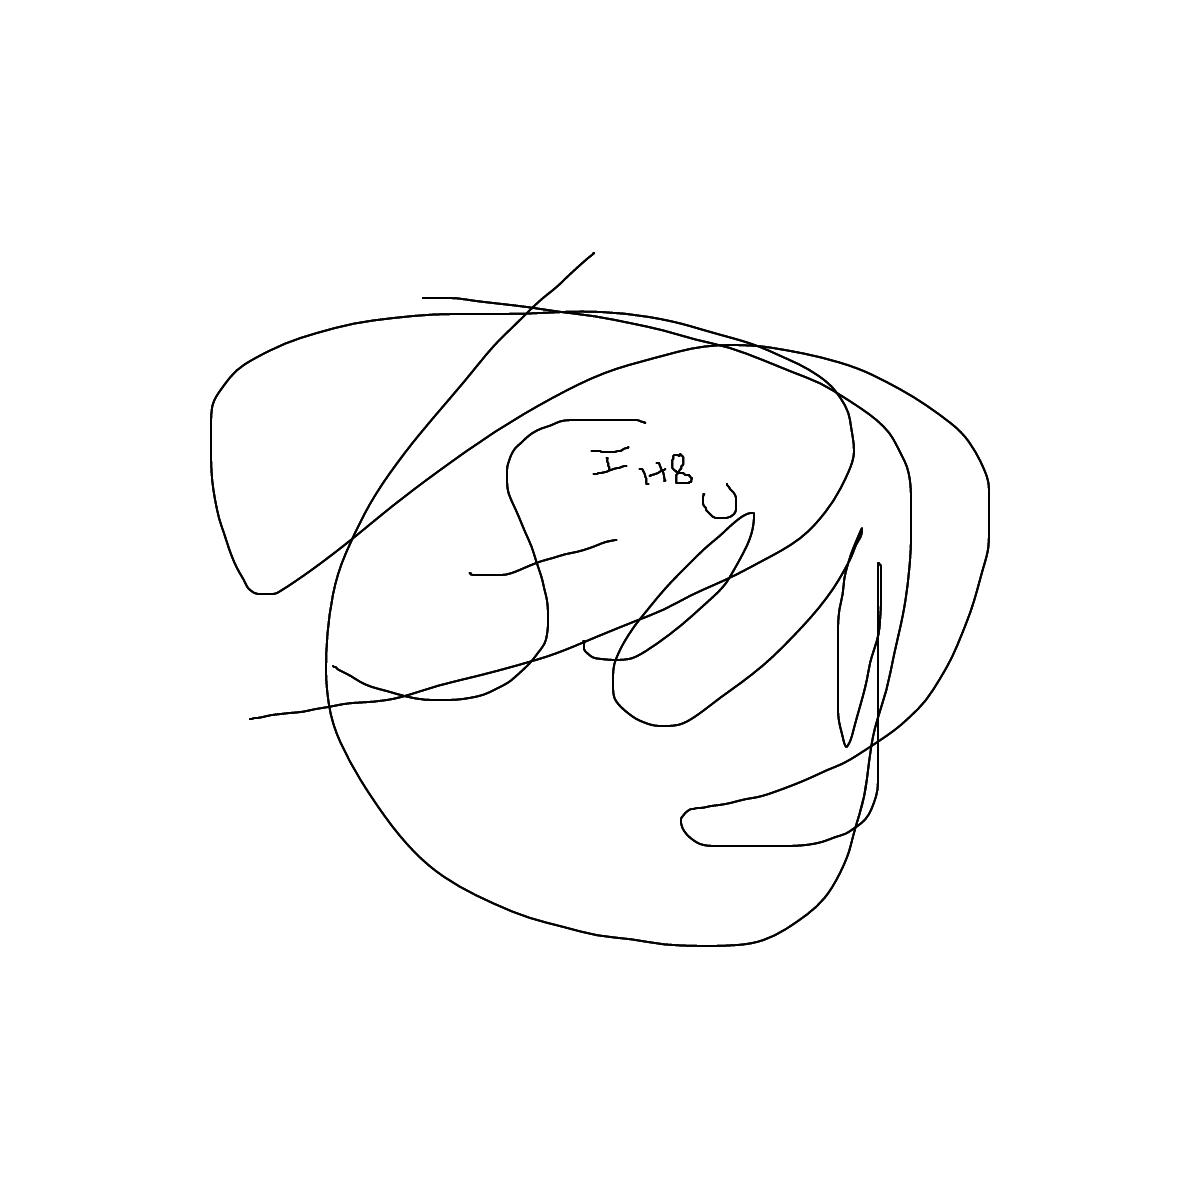 BAAAM drawing#15235 lat:28.2905521392822270lng: -81.2425689697265600